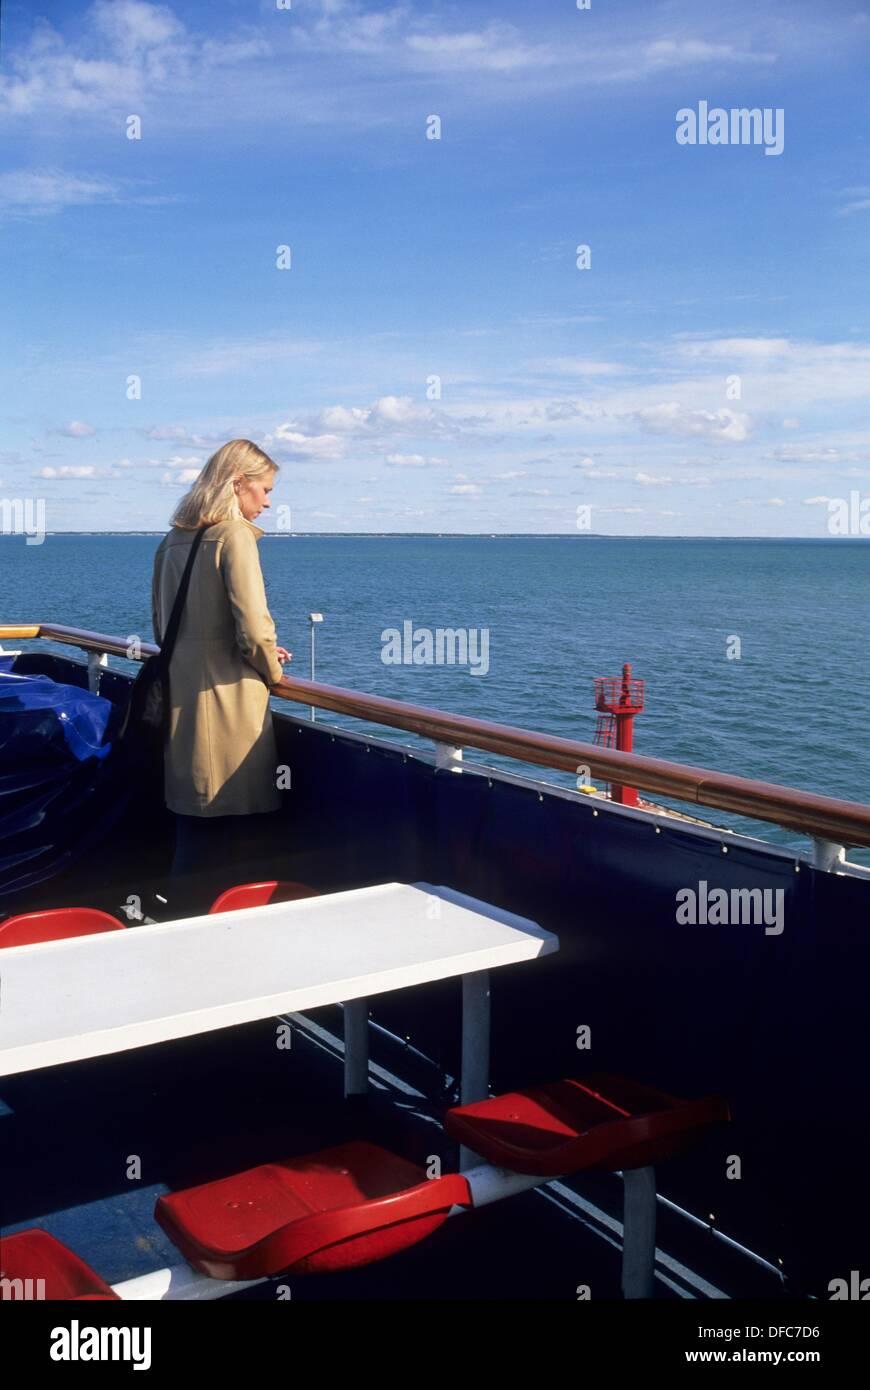 a bord du ferry pour Saaremaa,region de Saare,Estonie,pays balte,europe du nord - Stock Image